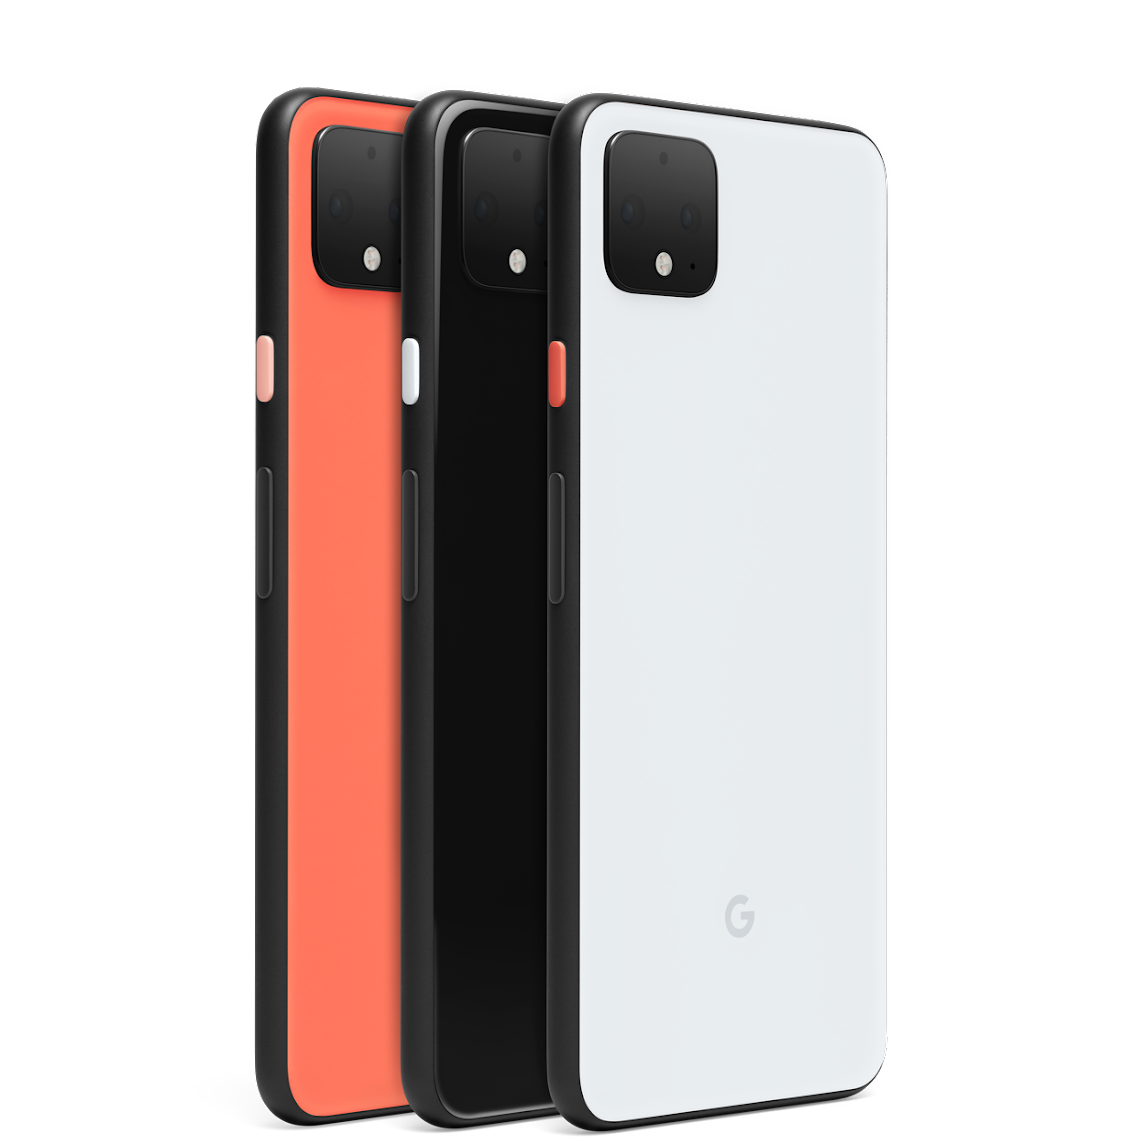 Pixel 4 series- color options